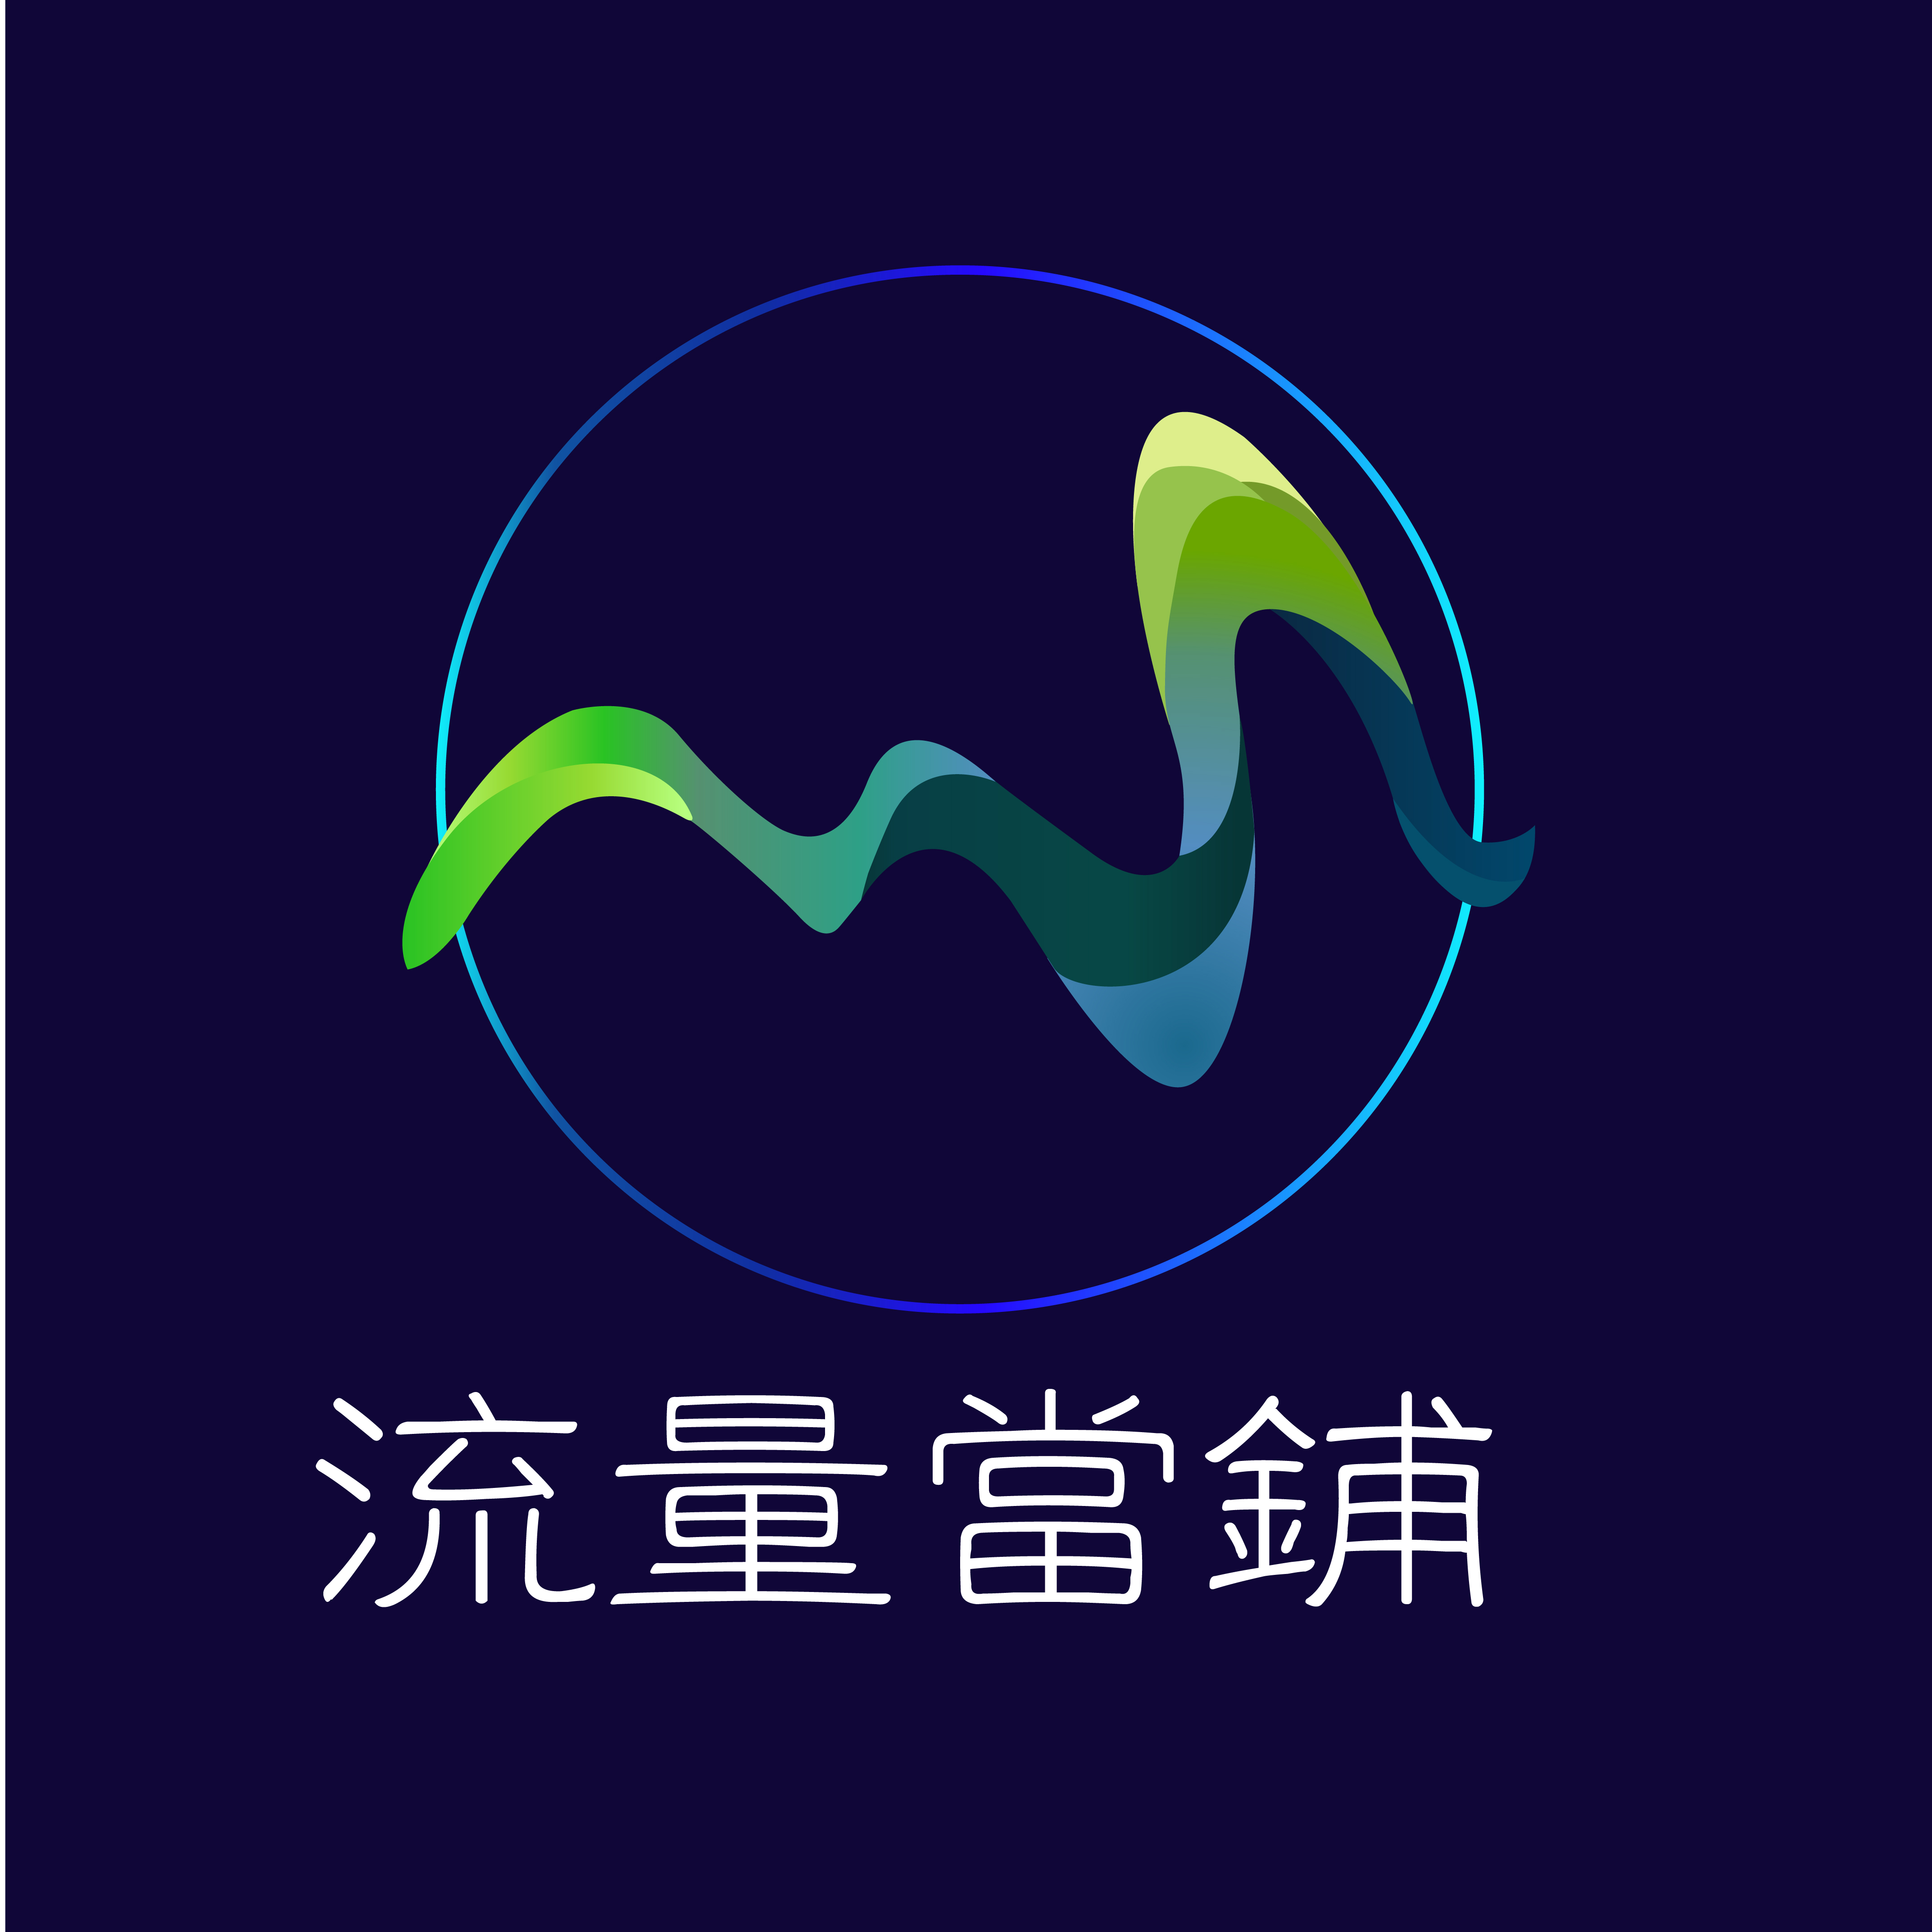 logo-视觉创意图片